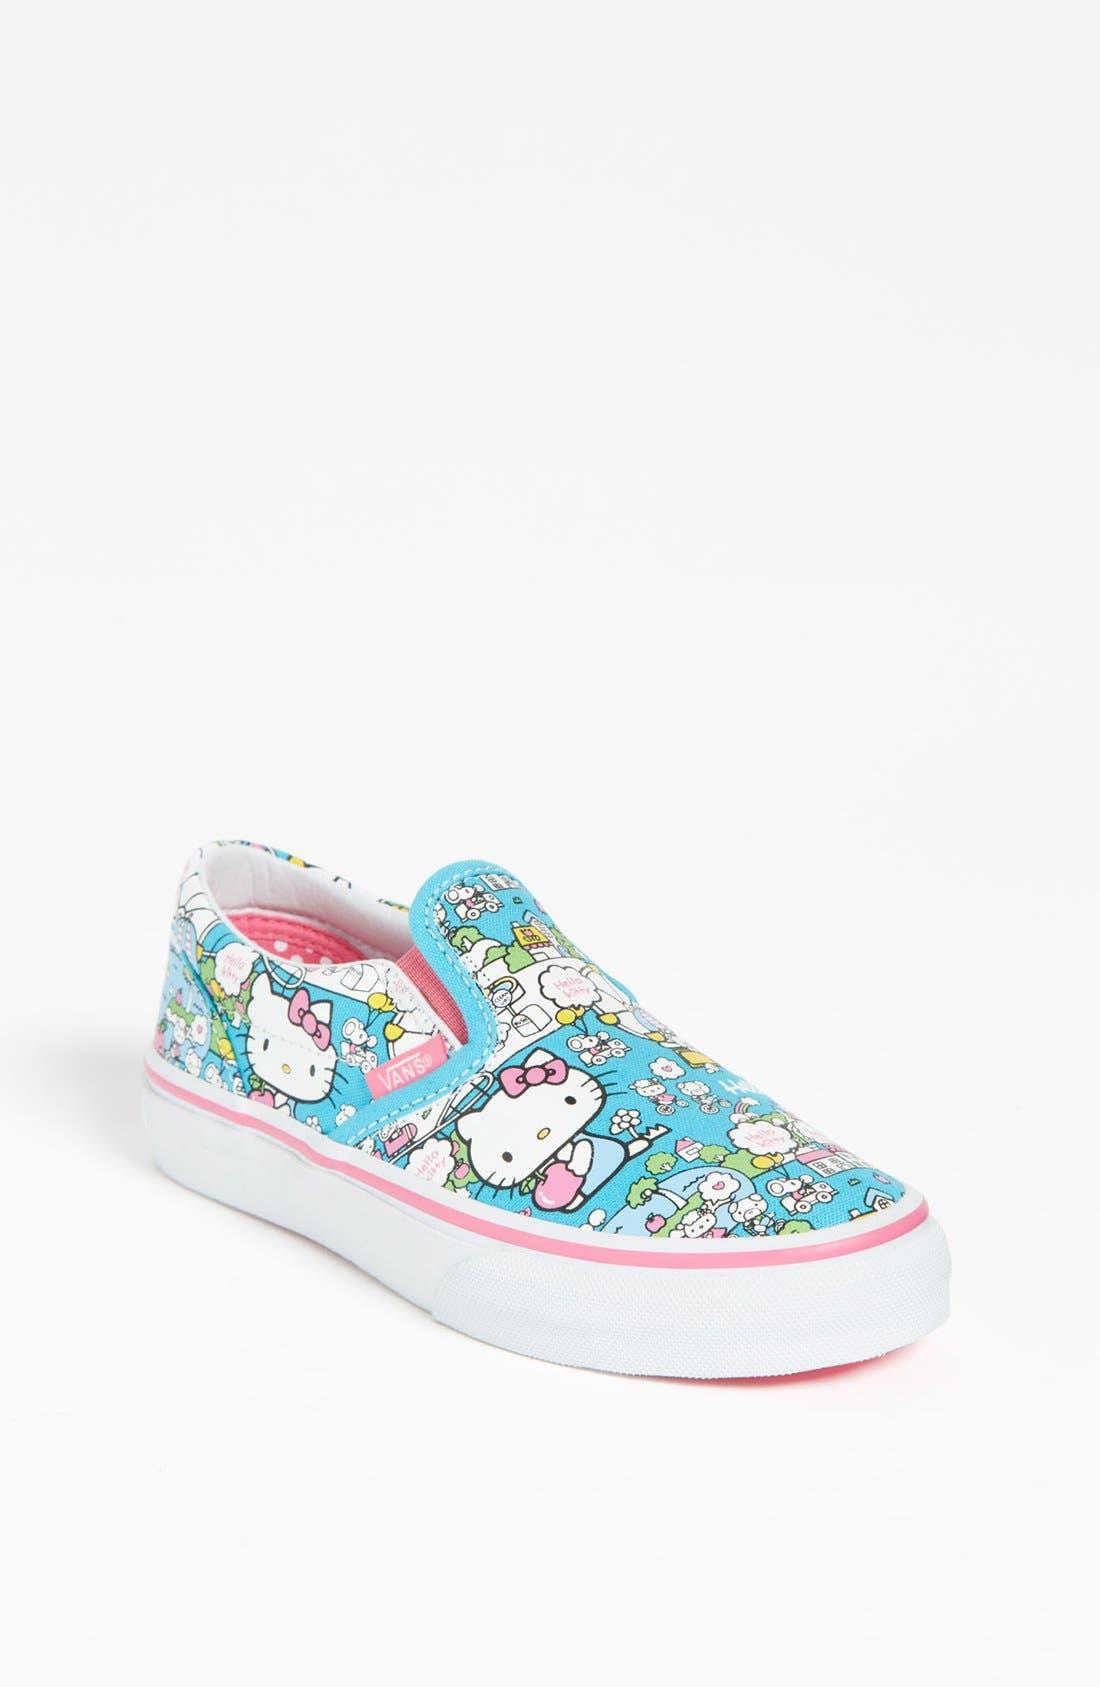 Main Image - Vans 'Hello Kitty®' Classic Slip-On (Toddler, Little Kid & Big Kid)